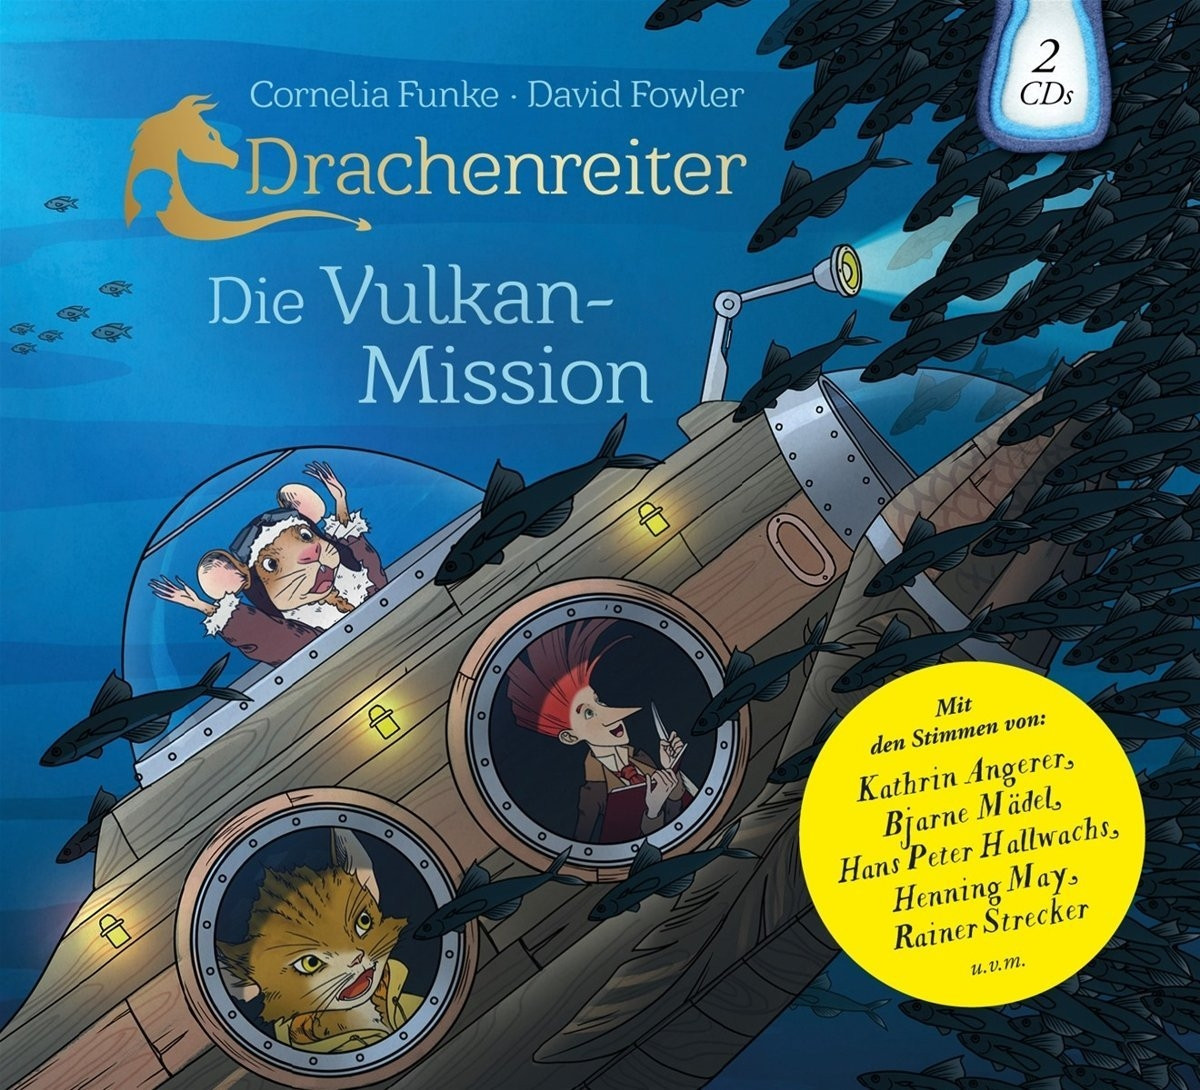 Cornelia Funke & David Fowler - Drachenreiter: Die Vulkan–Mission (Hörspiel)